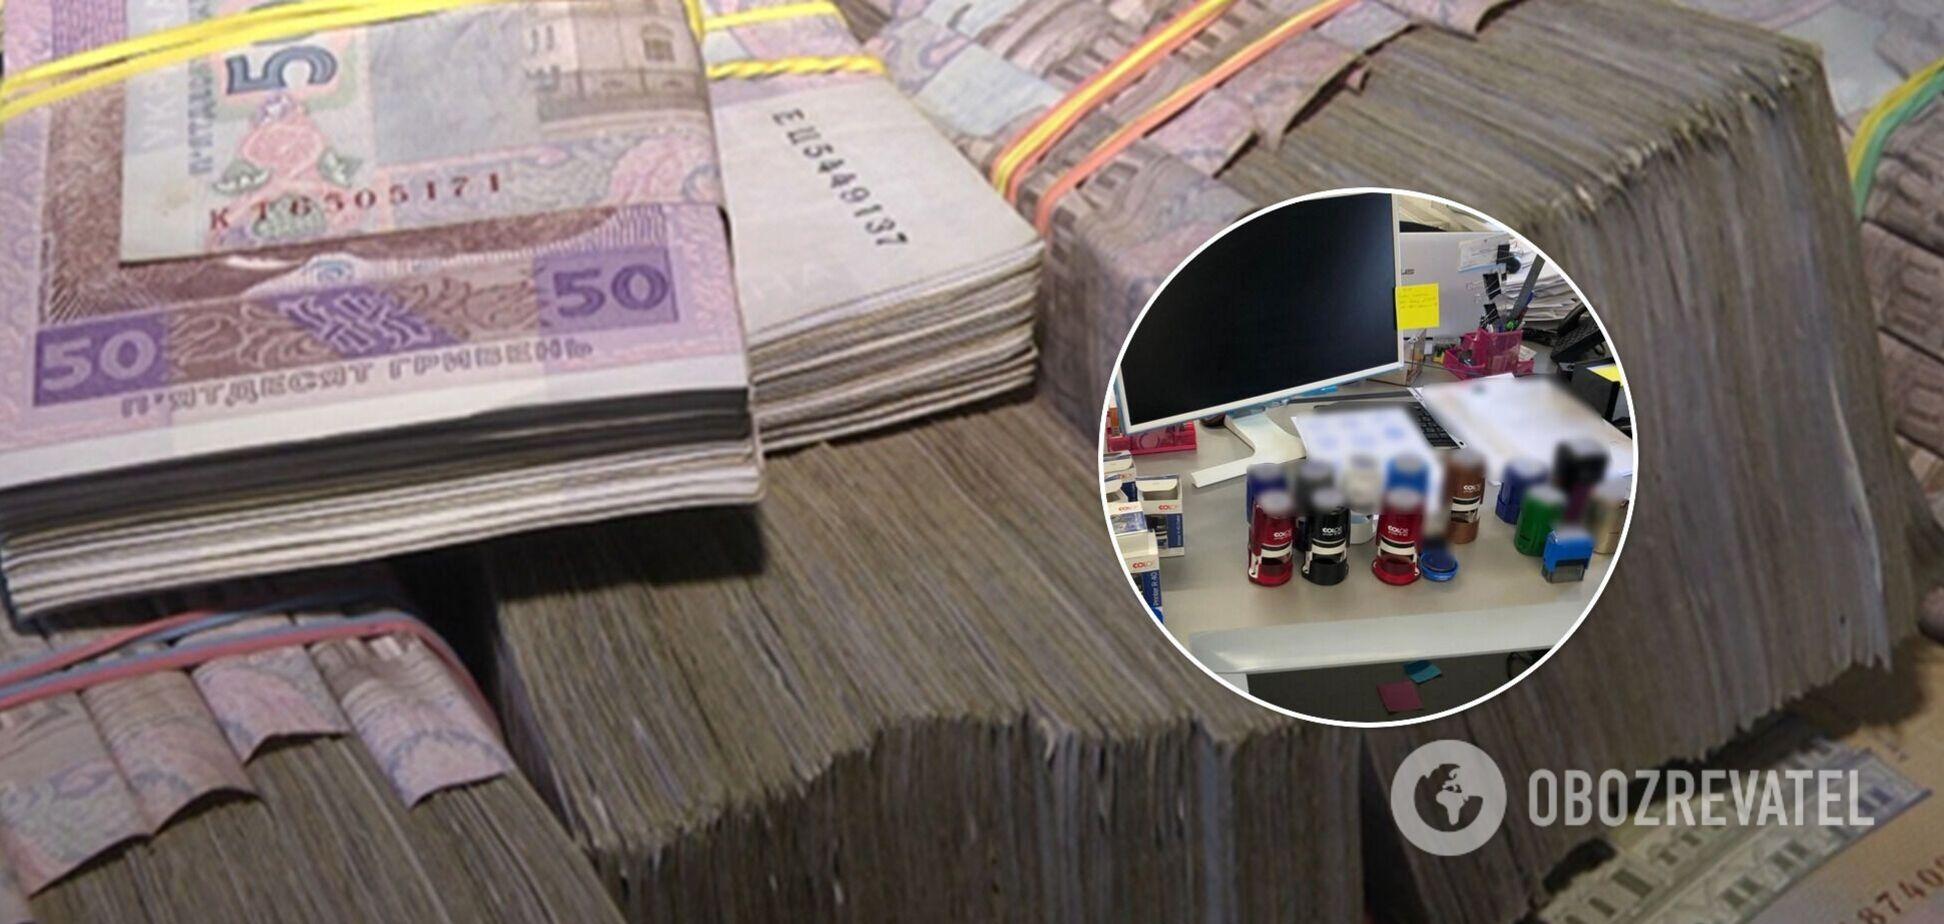 Втрати держбюджету склали понад 37,8 млн грн